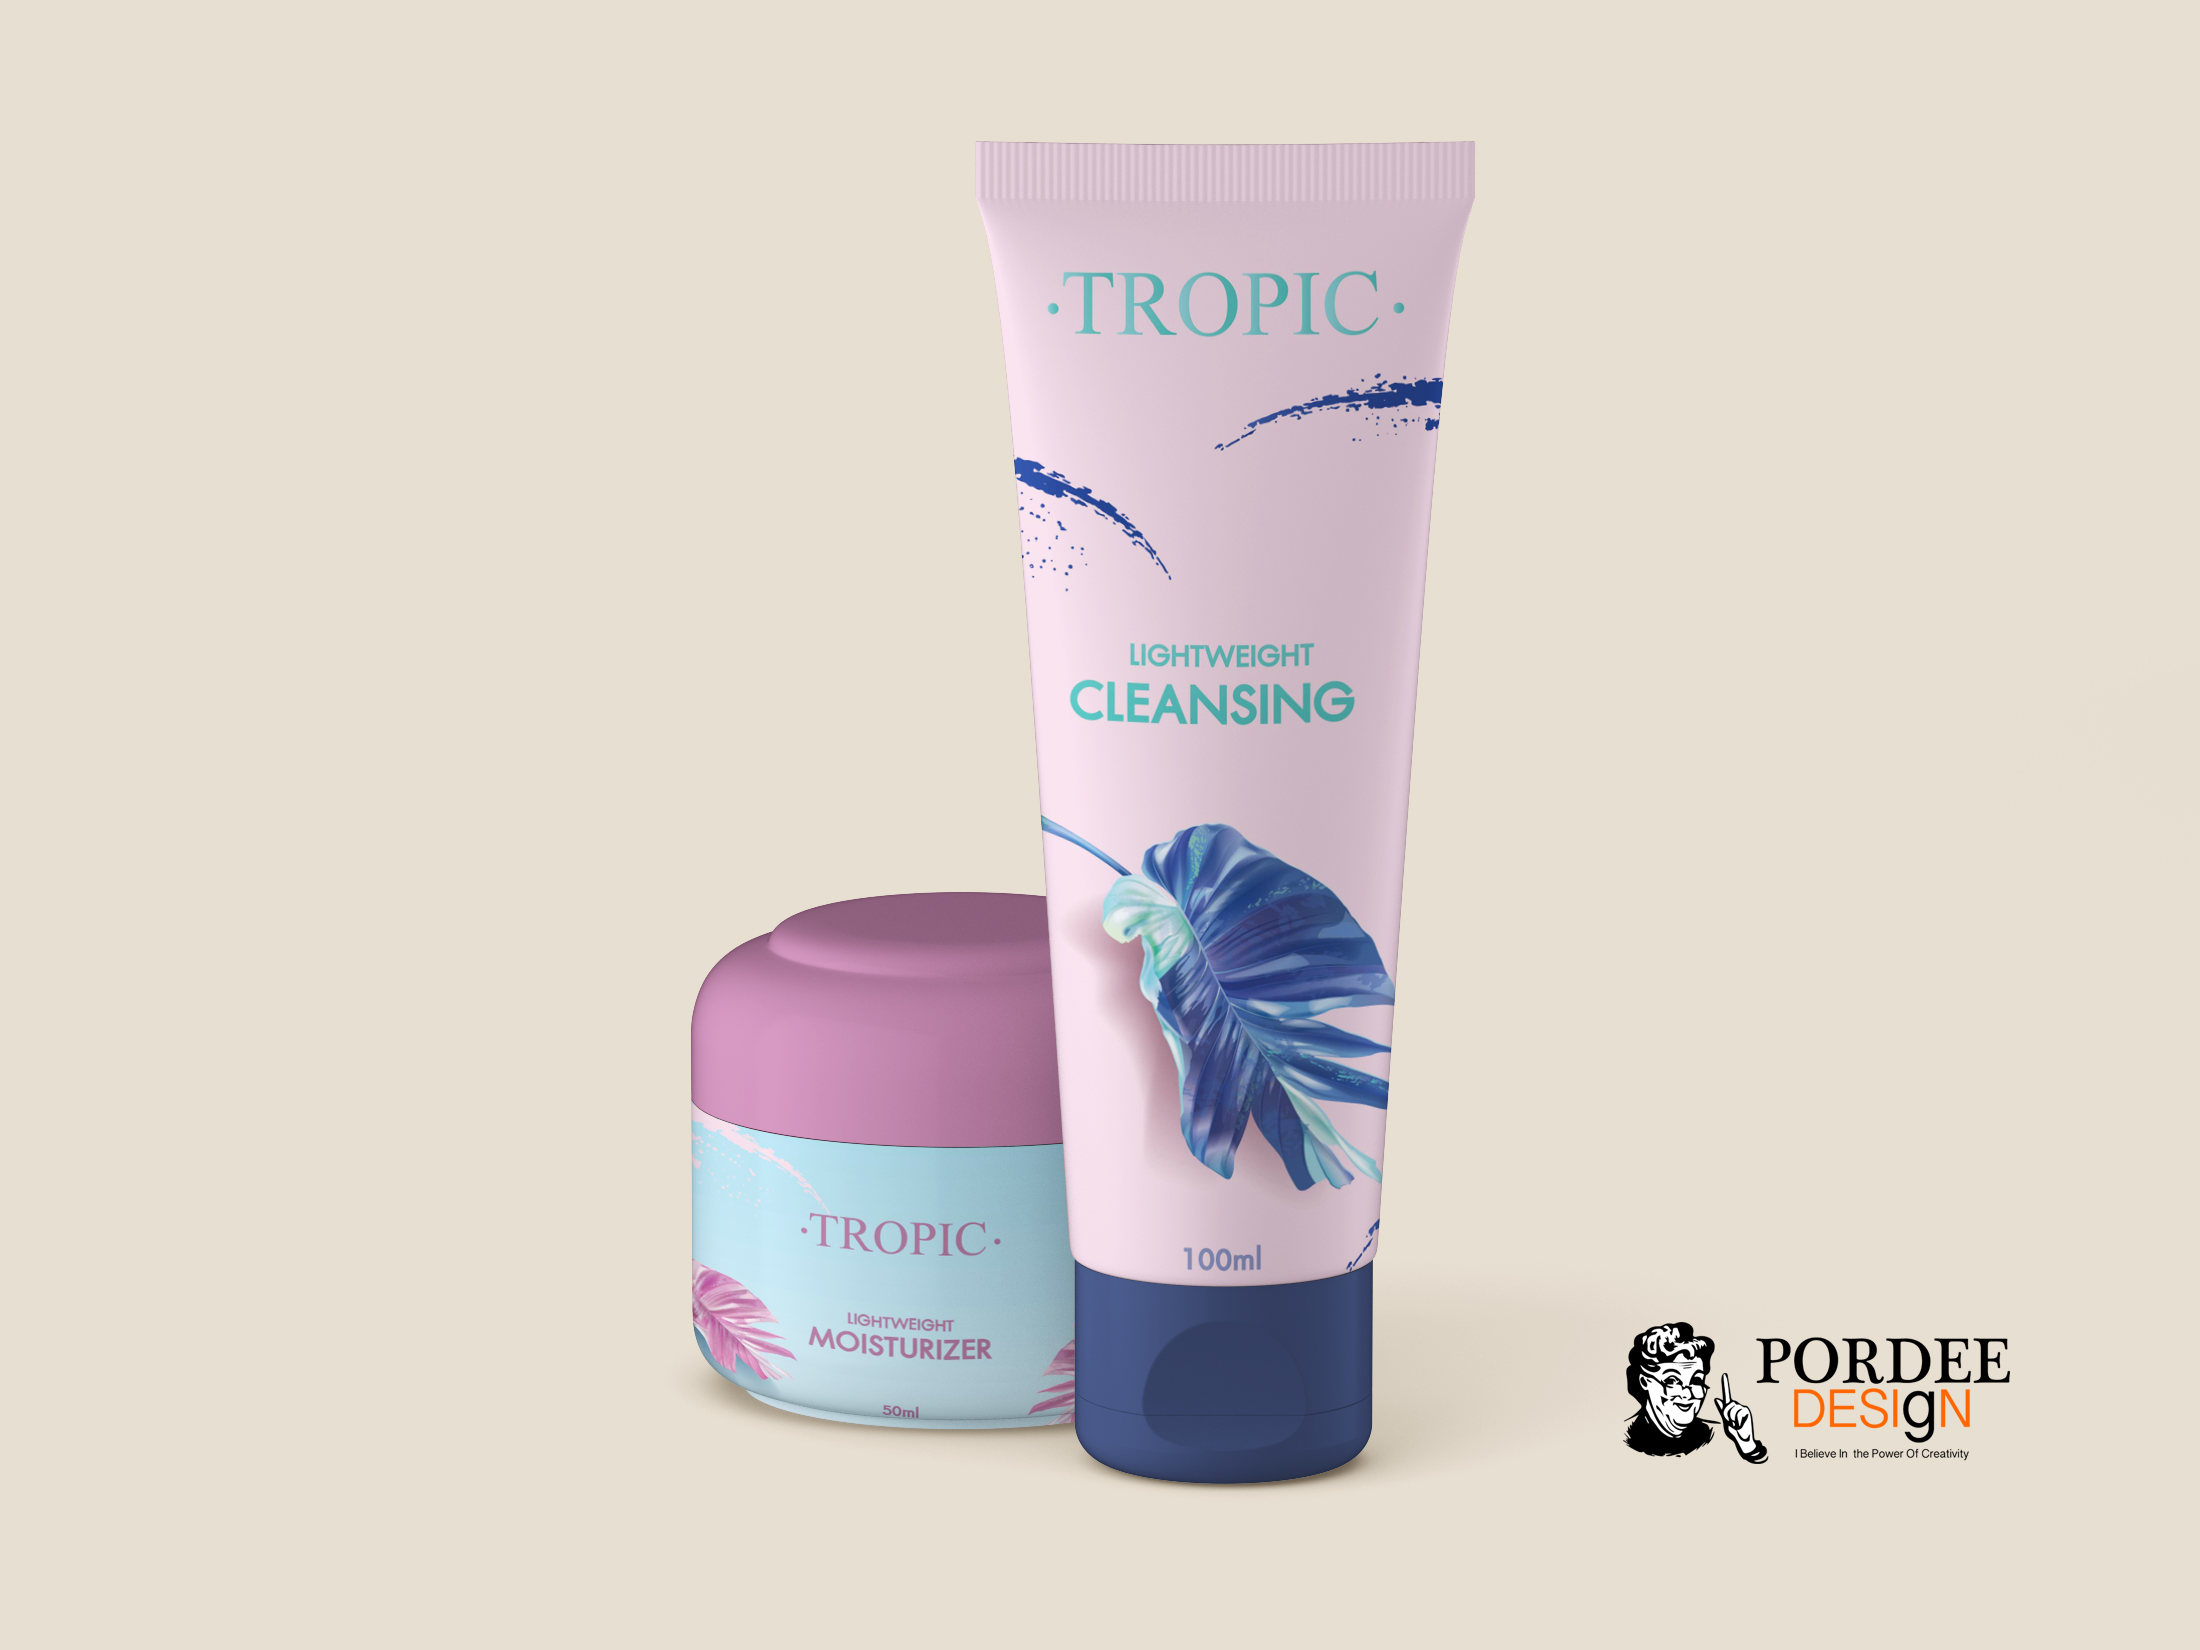 Tropic-Mockup_3-1